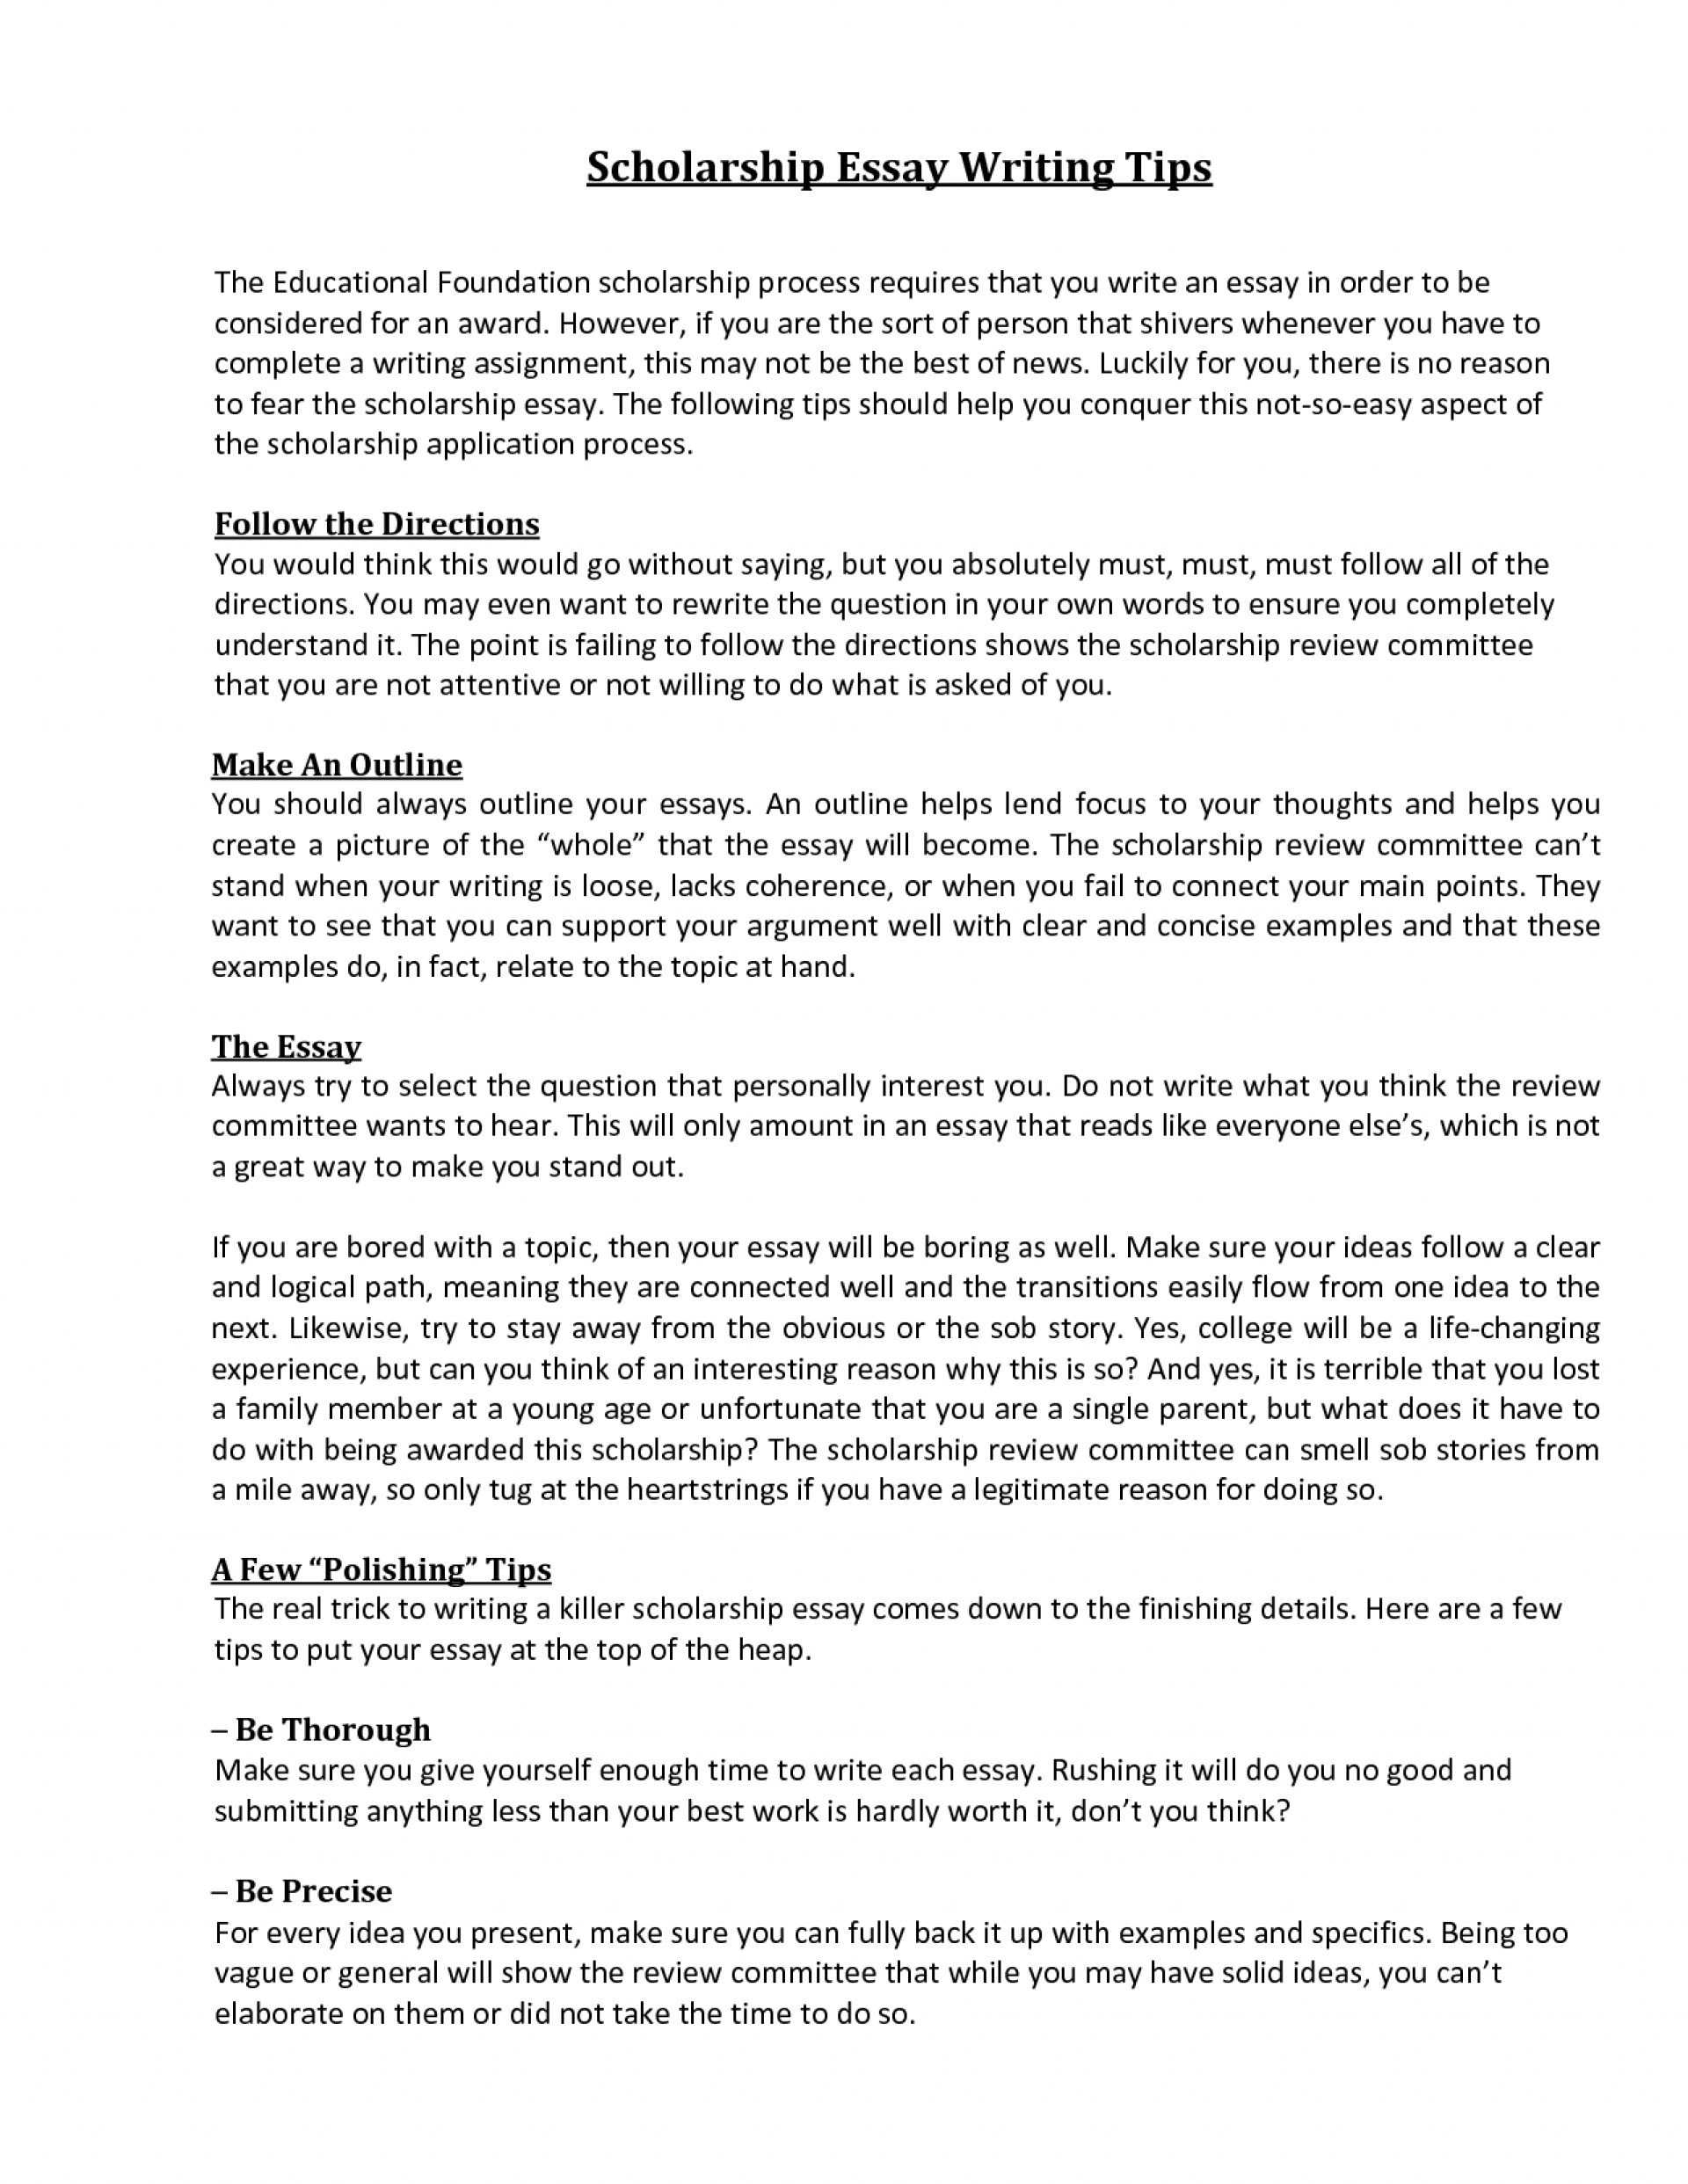 003 Example Scholarships Ziolxujgwq Phenomenal Scholarship Essays Sample For Masters 500 Words Nursing 1920